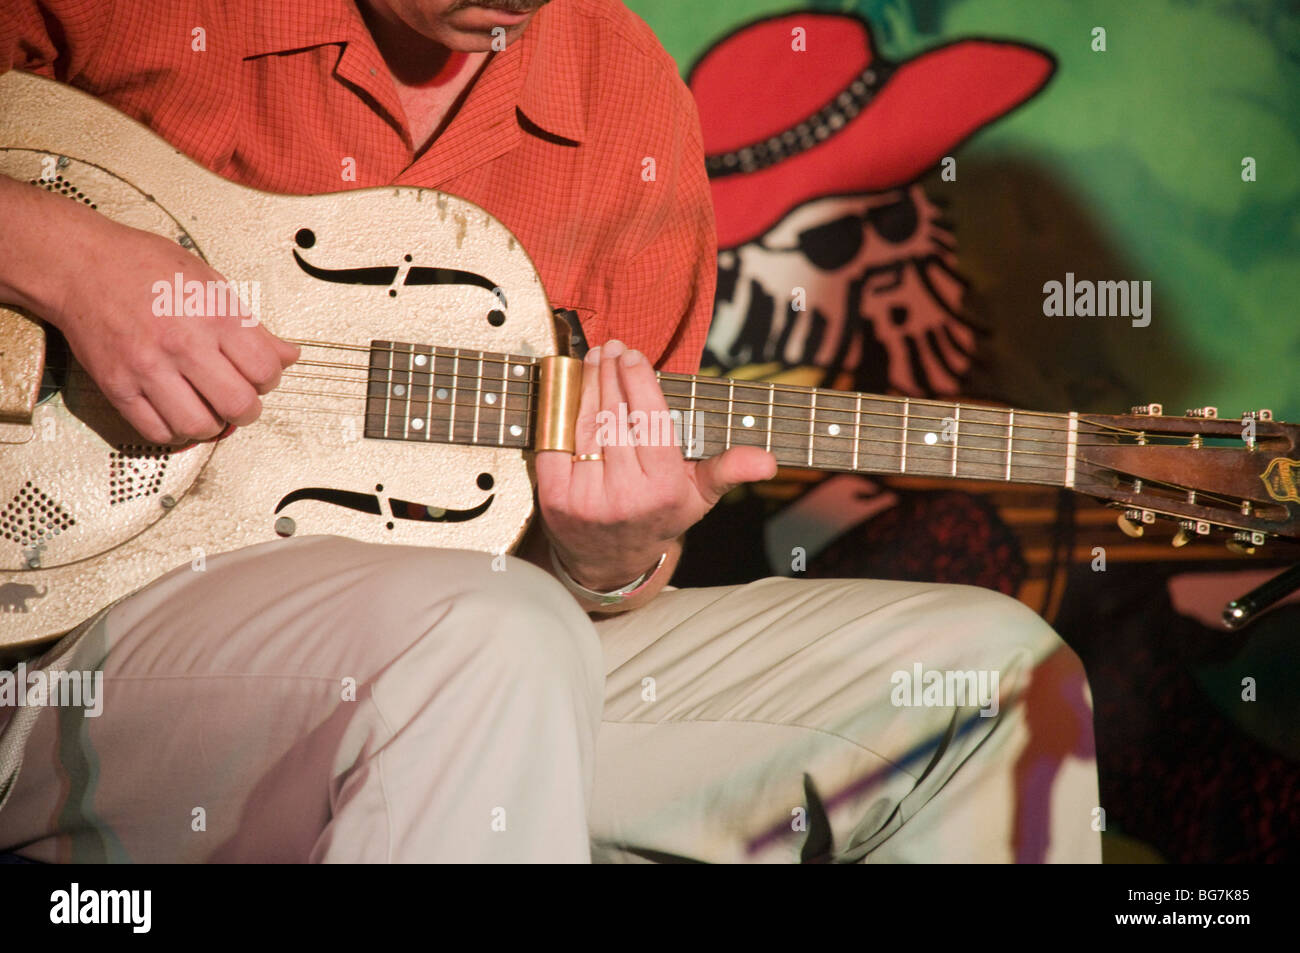 Israel, Nof Ginosar, Jacob's Ladder Music festival, guitarist uses a bottleneck - Stock Image